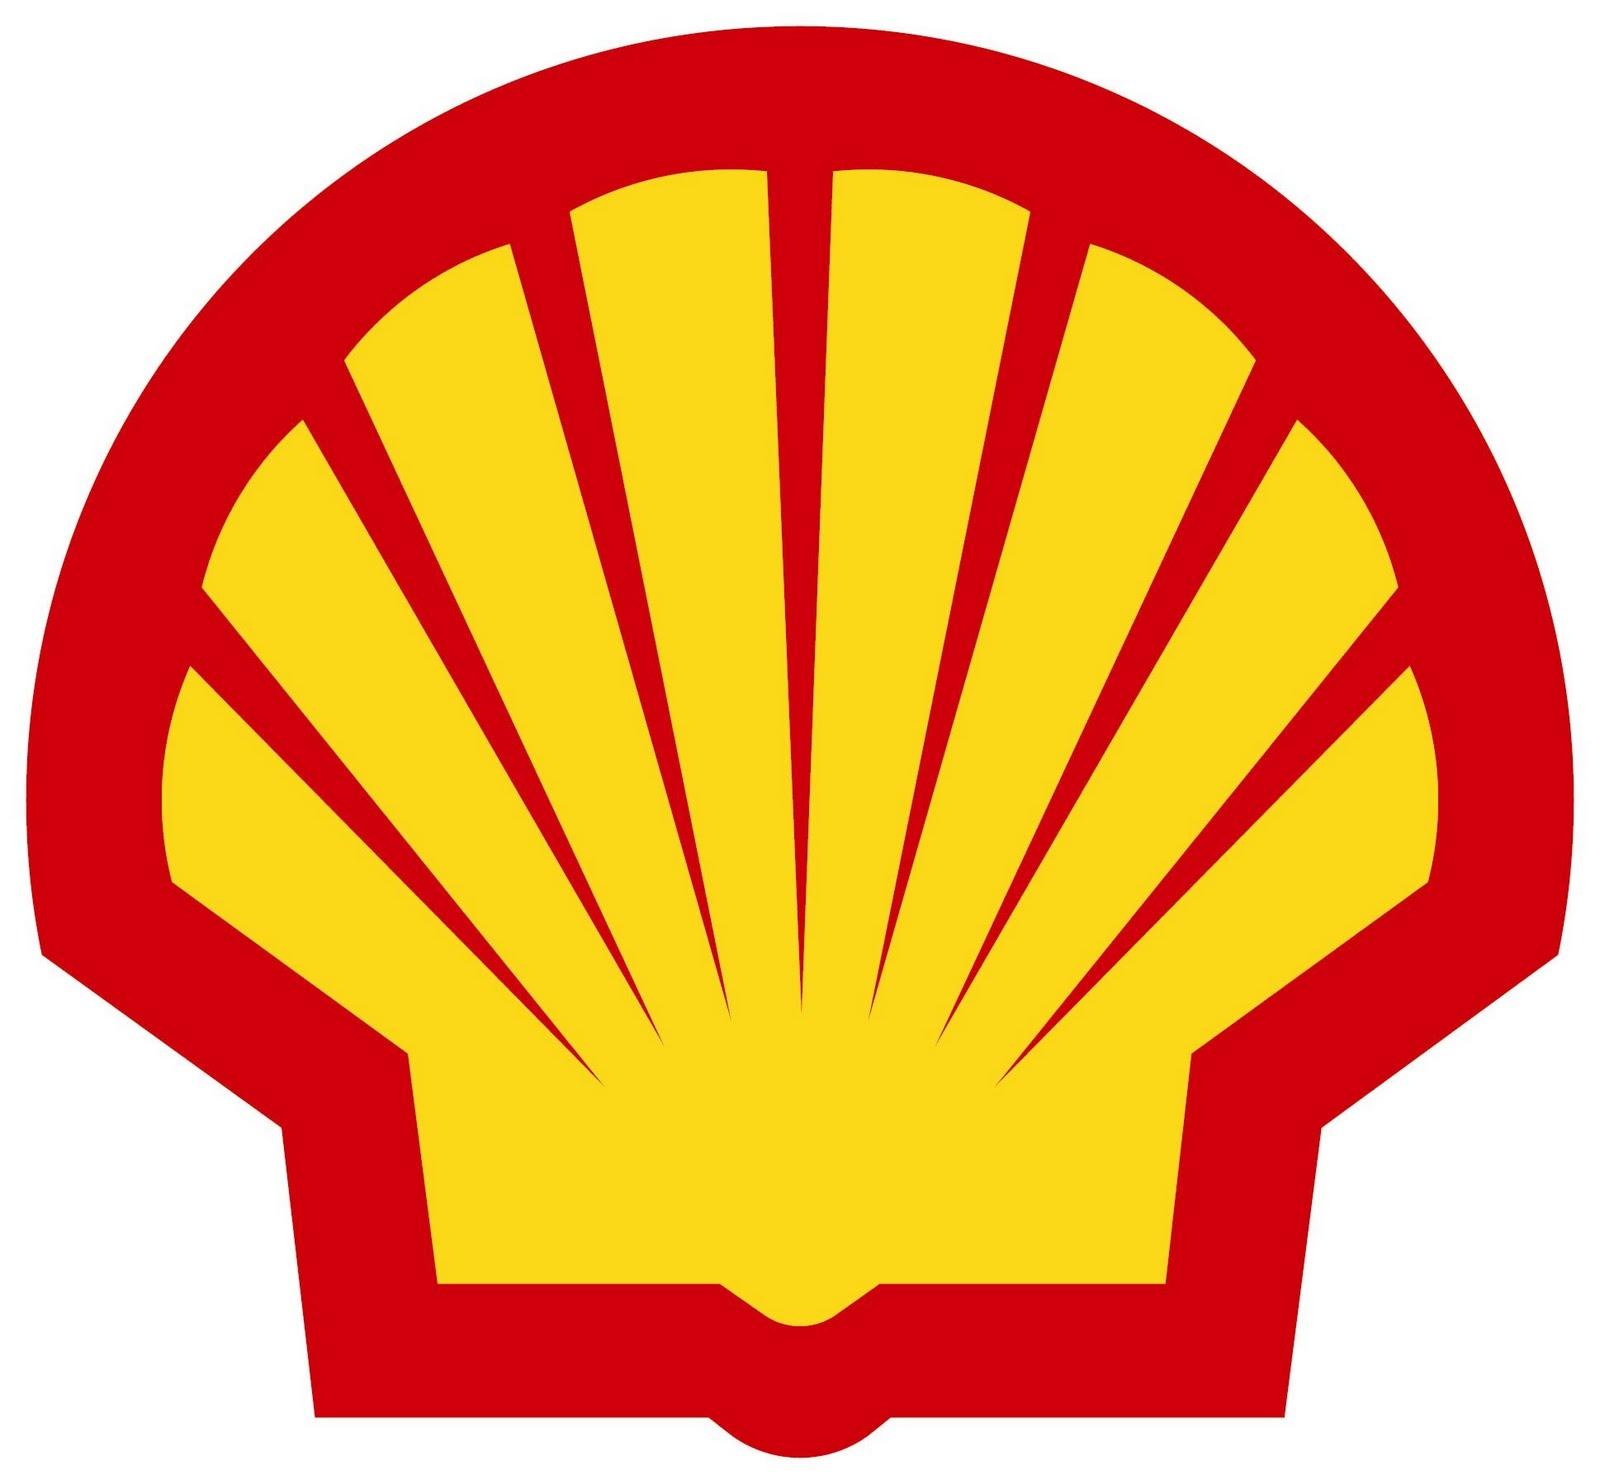 History of All Logos: All Shell Logos